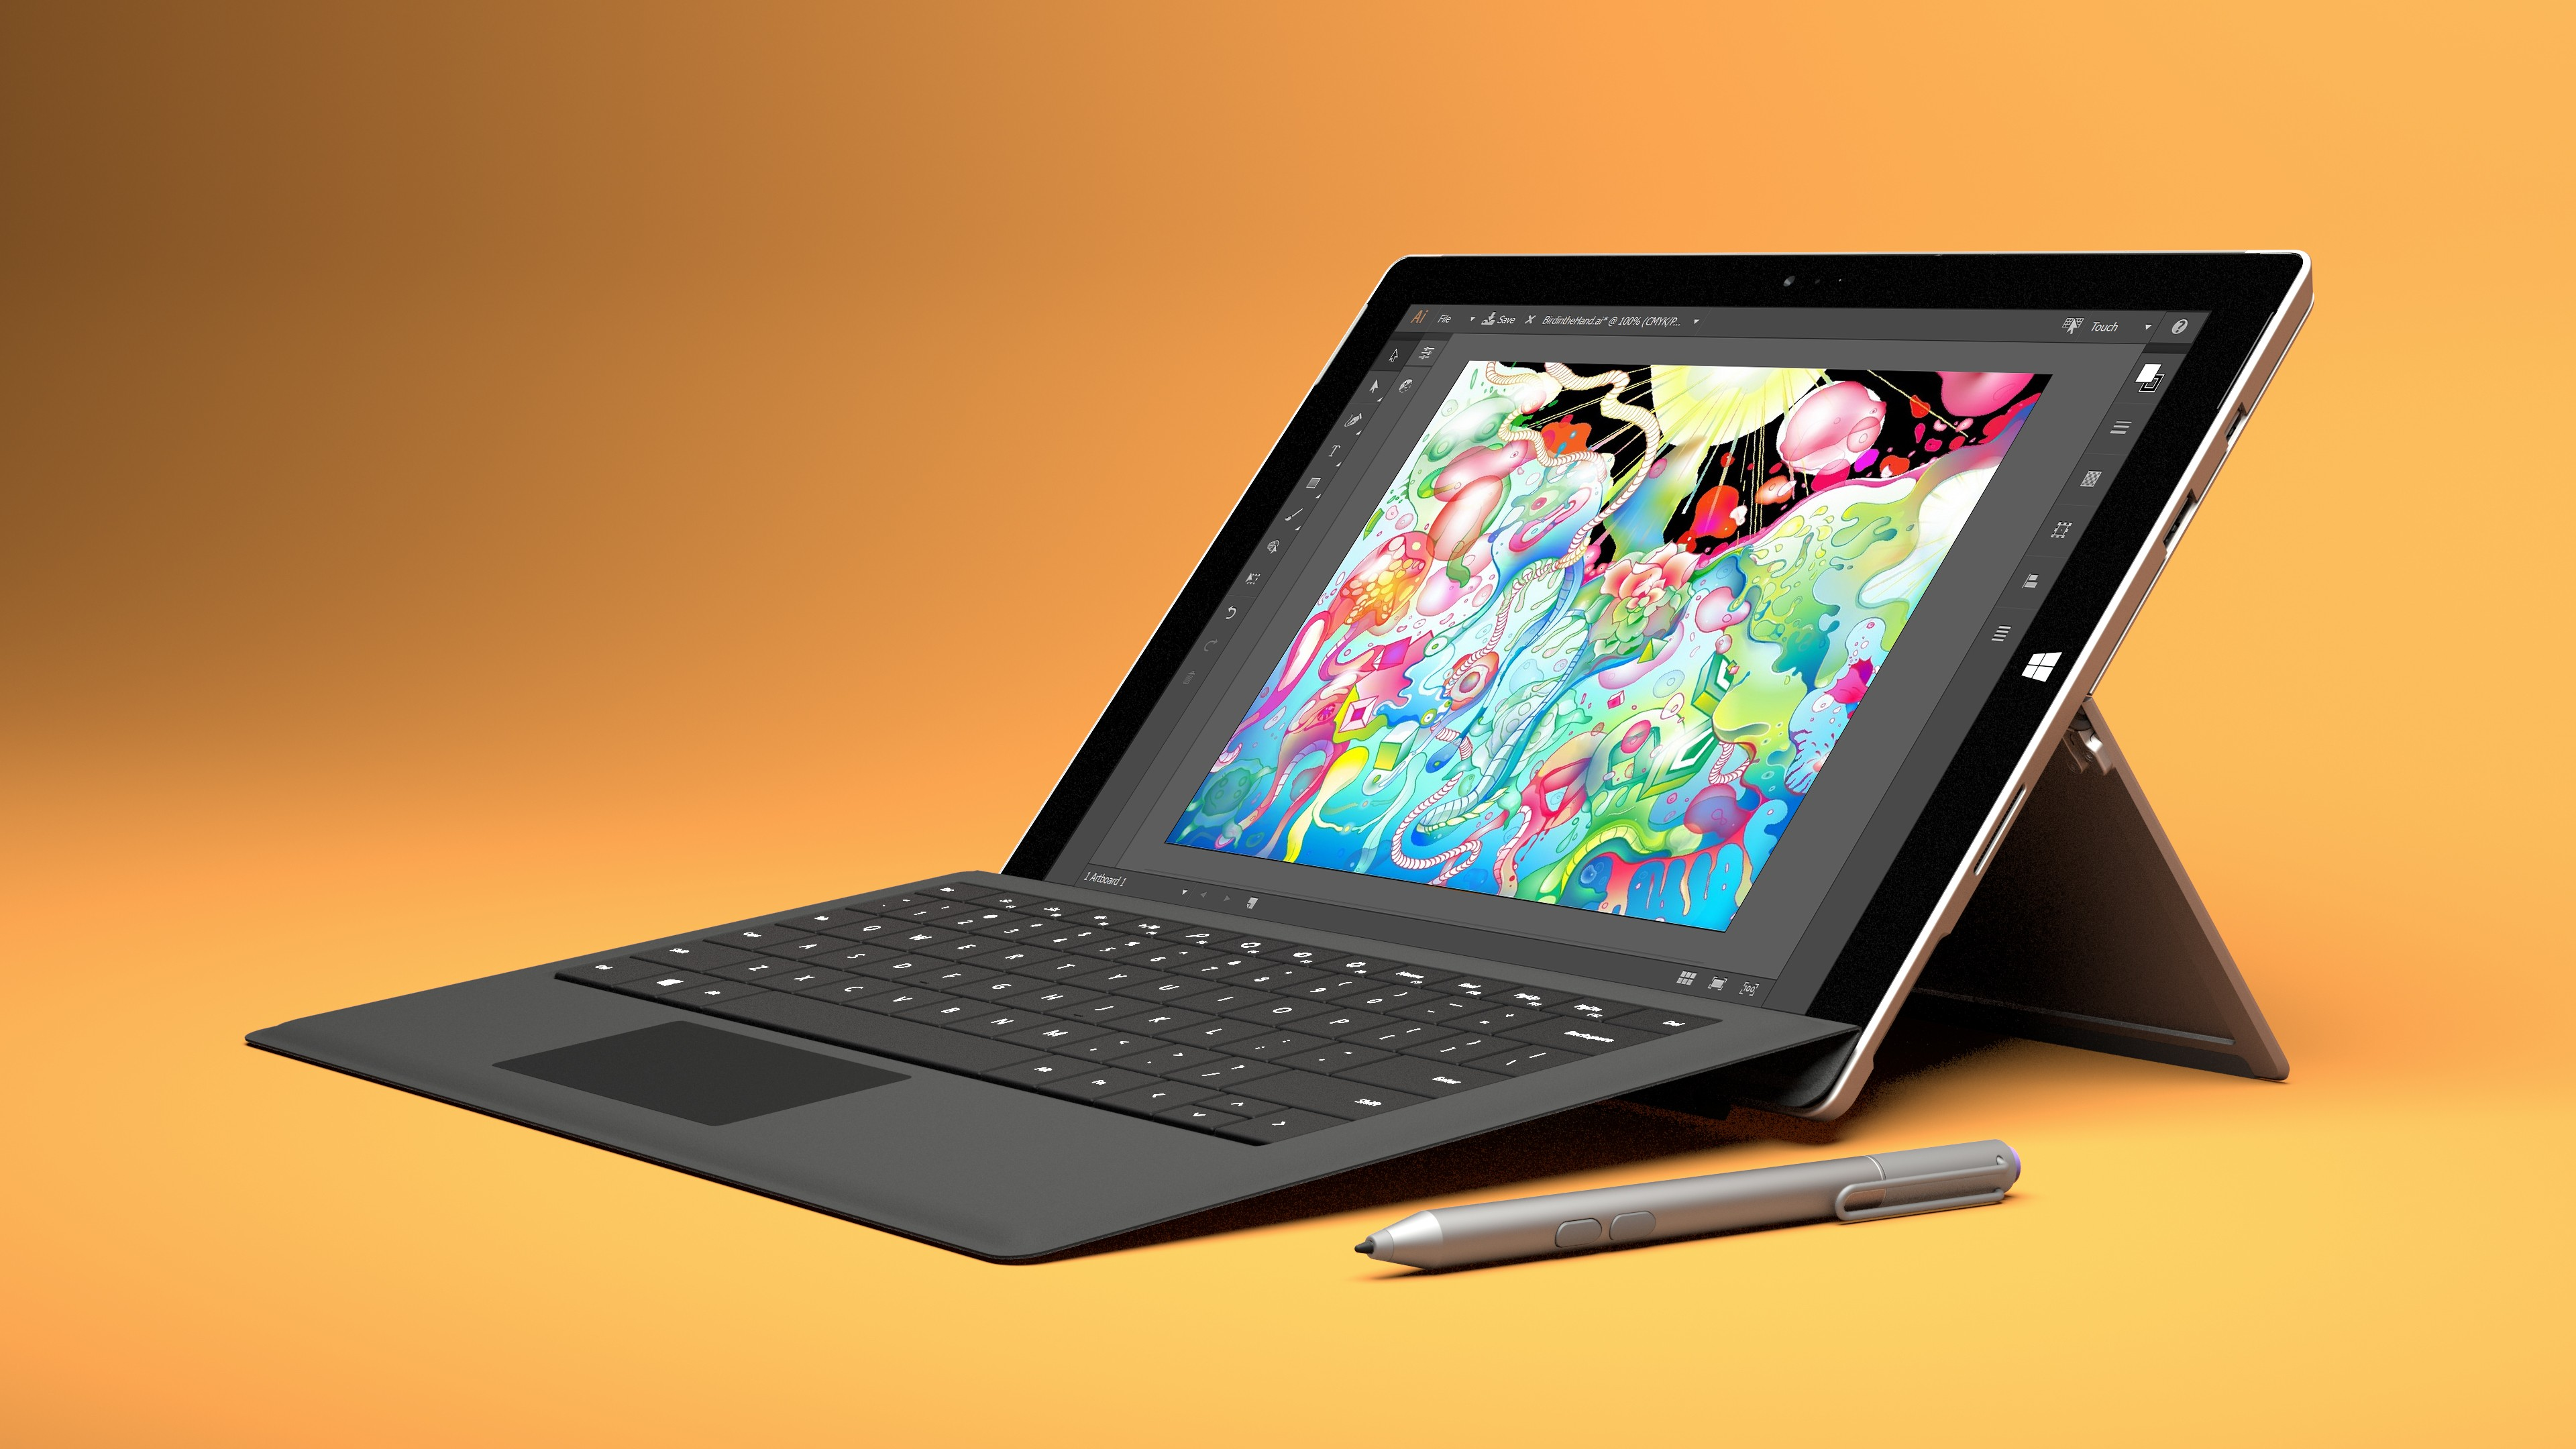 Wallpaper Microsoft Surface Pro 4 Tablet Hybrid Tablet